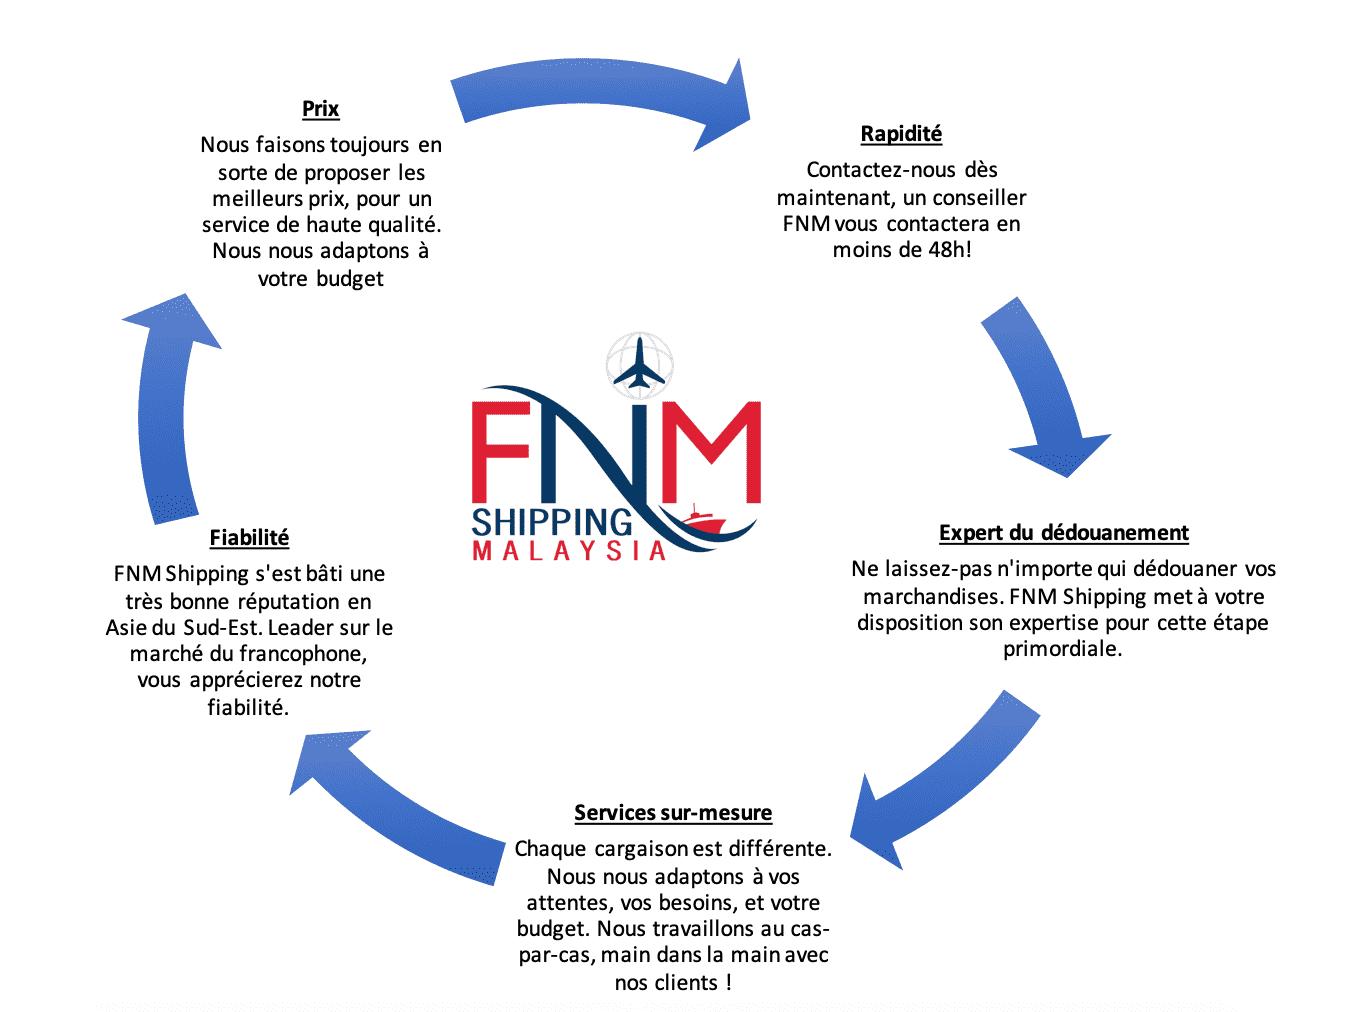 fnm malaysia services logistics